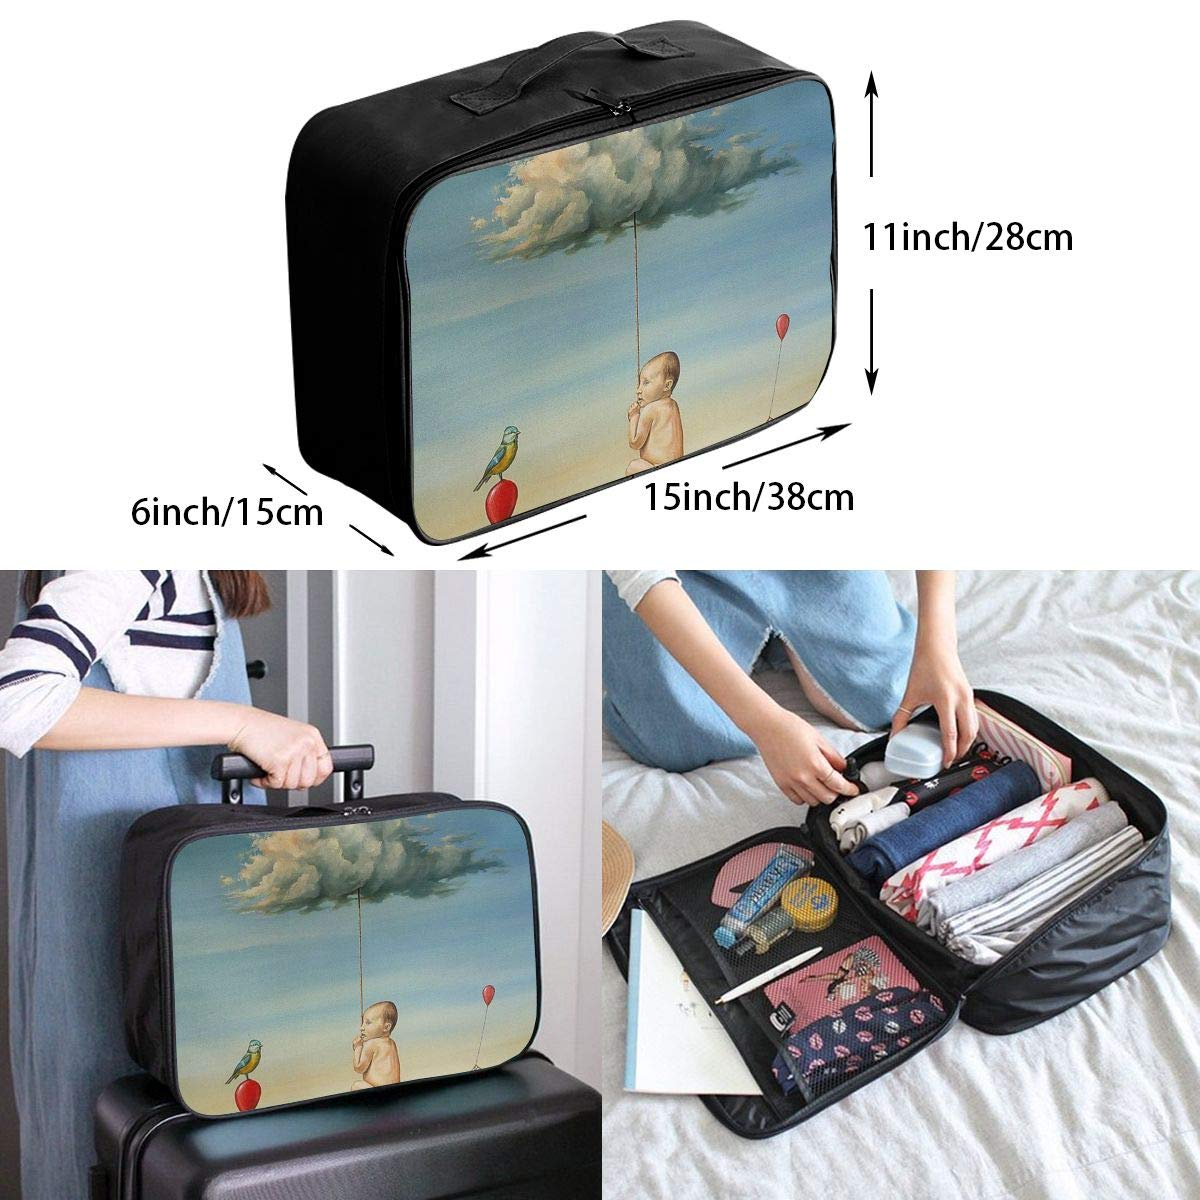 Travel Luggage Duffle Bag Lightweight Portable Handbag Surreal Art Print Large Capacity Waterproof Foldable Storage Tote